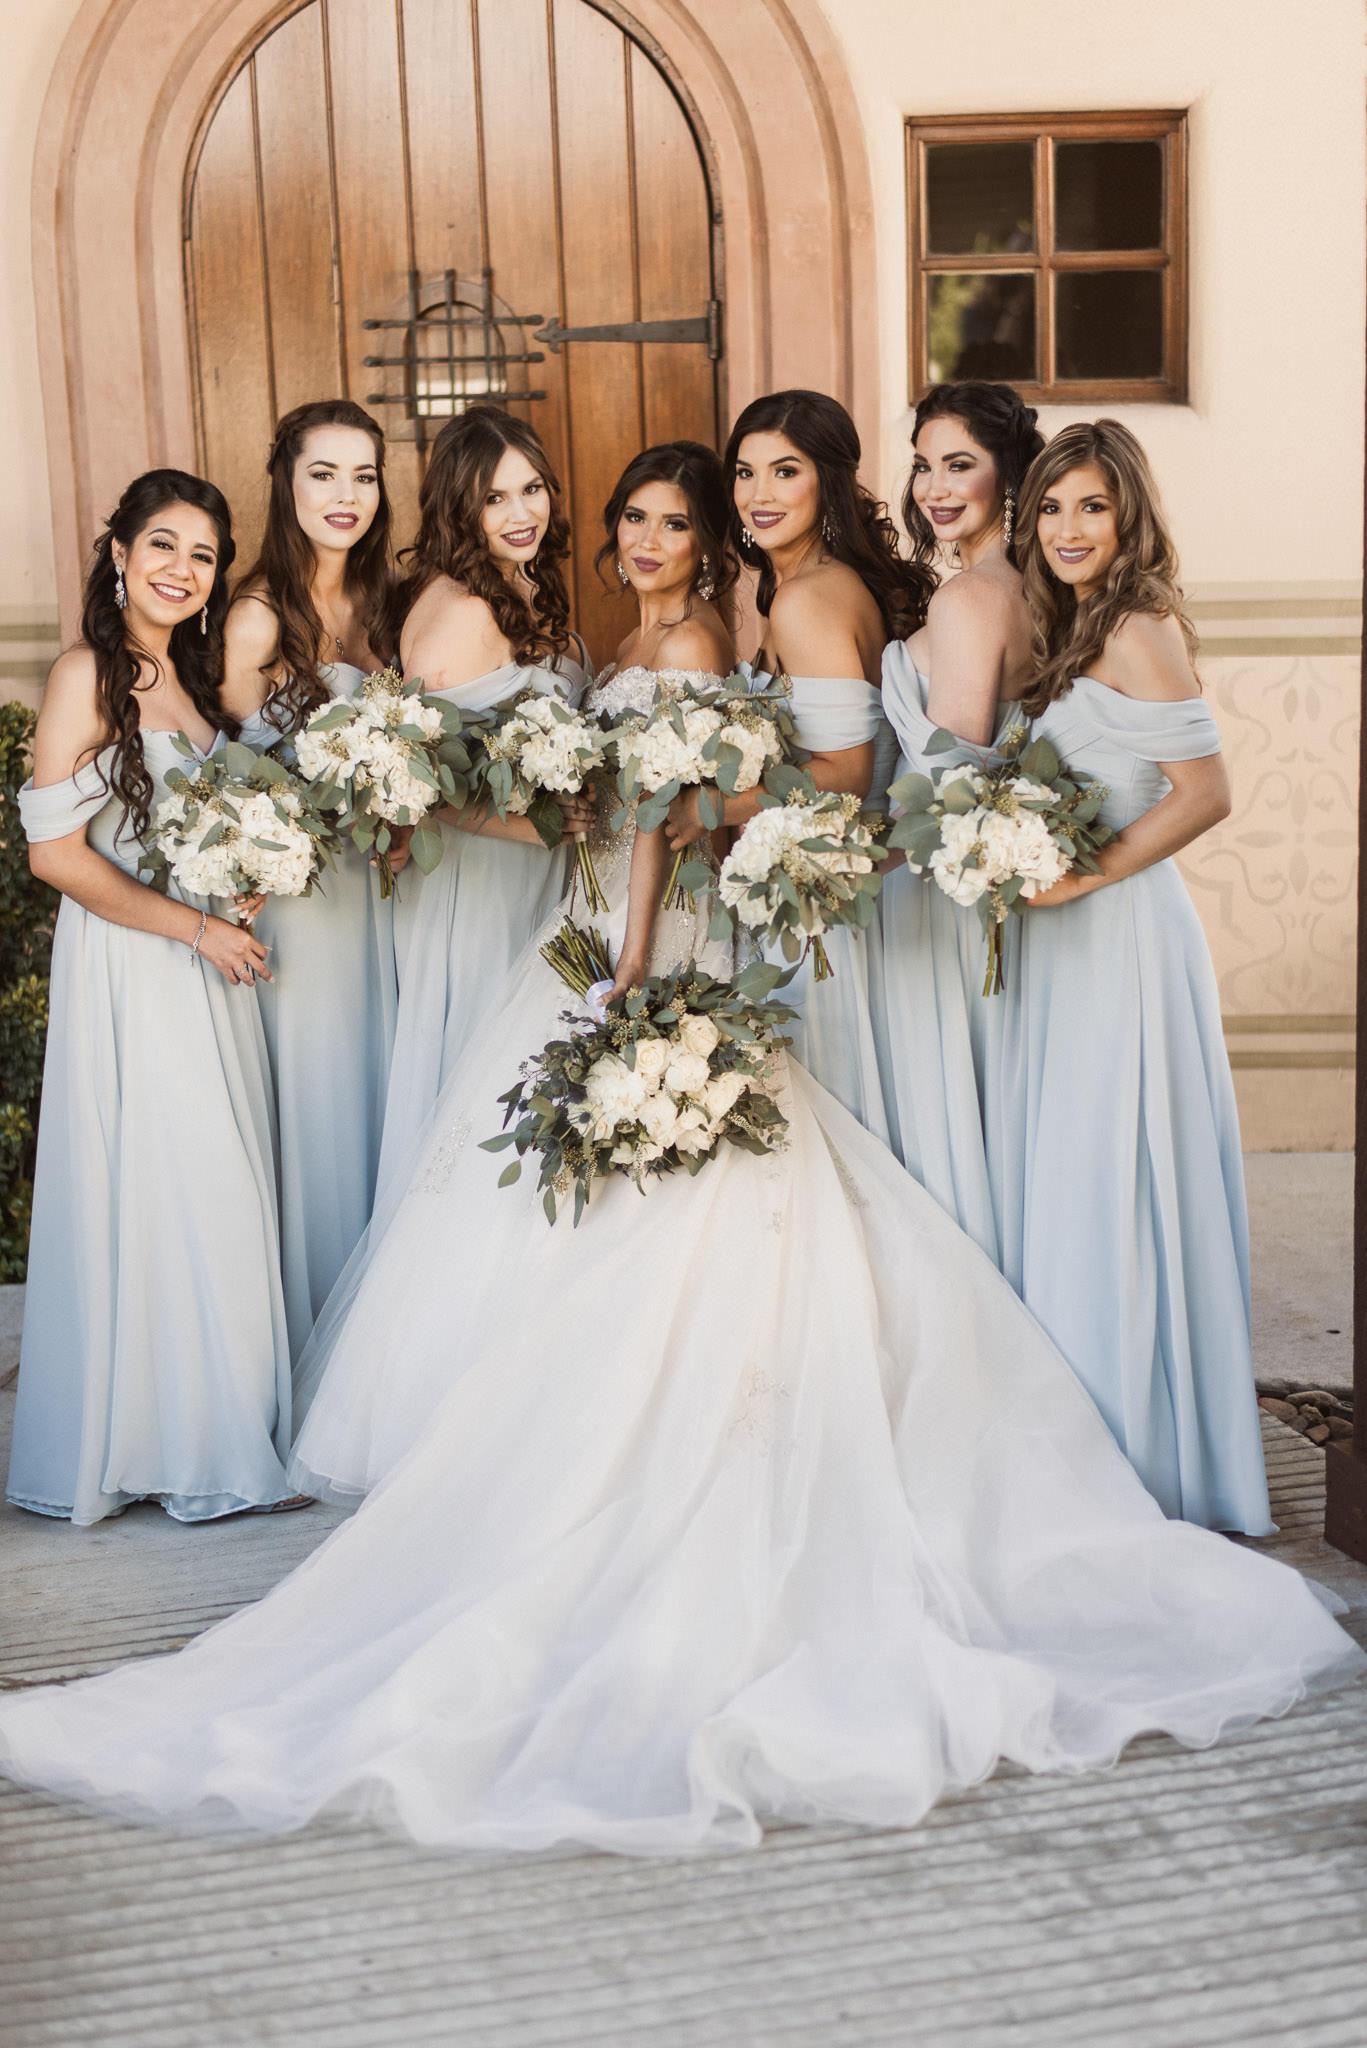 adriana-christian-wedding-re-sm-47.jpg